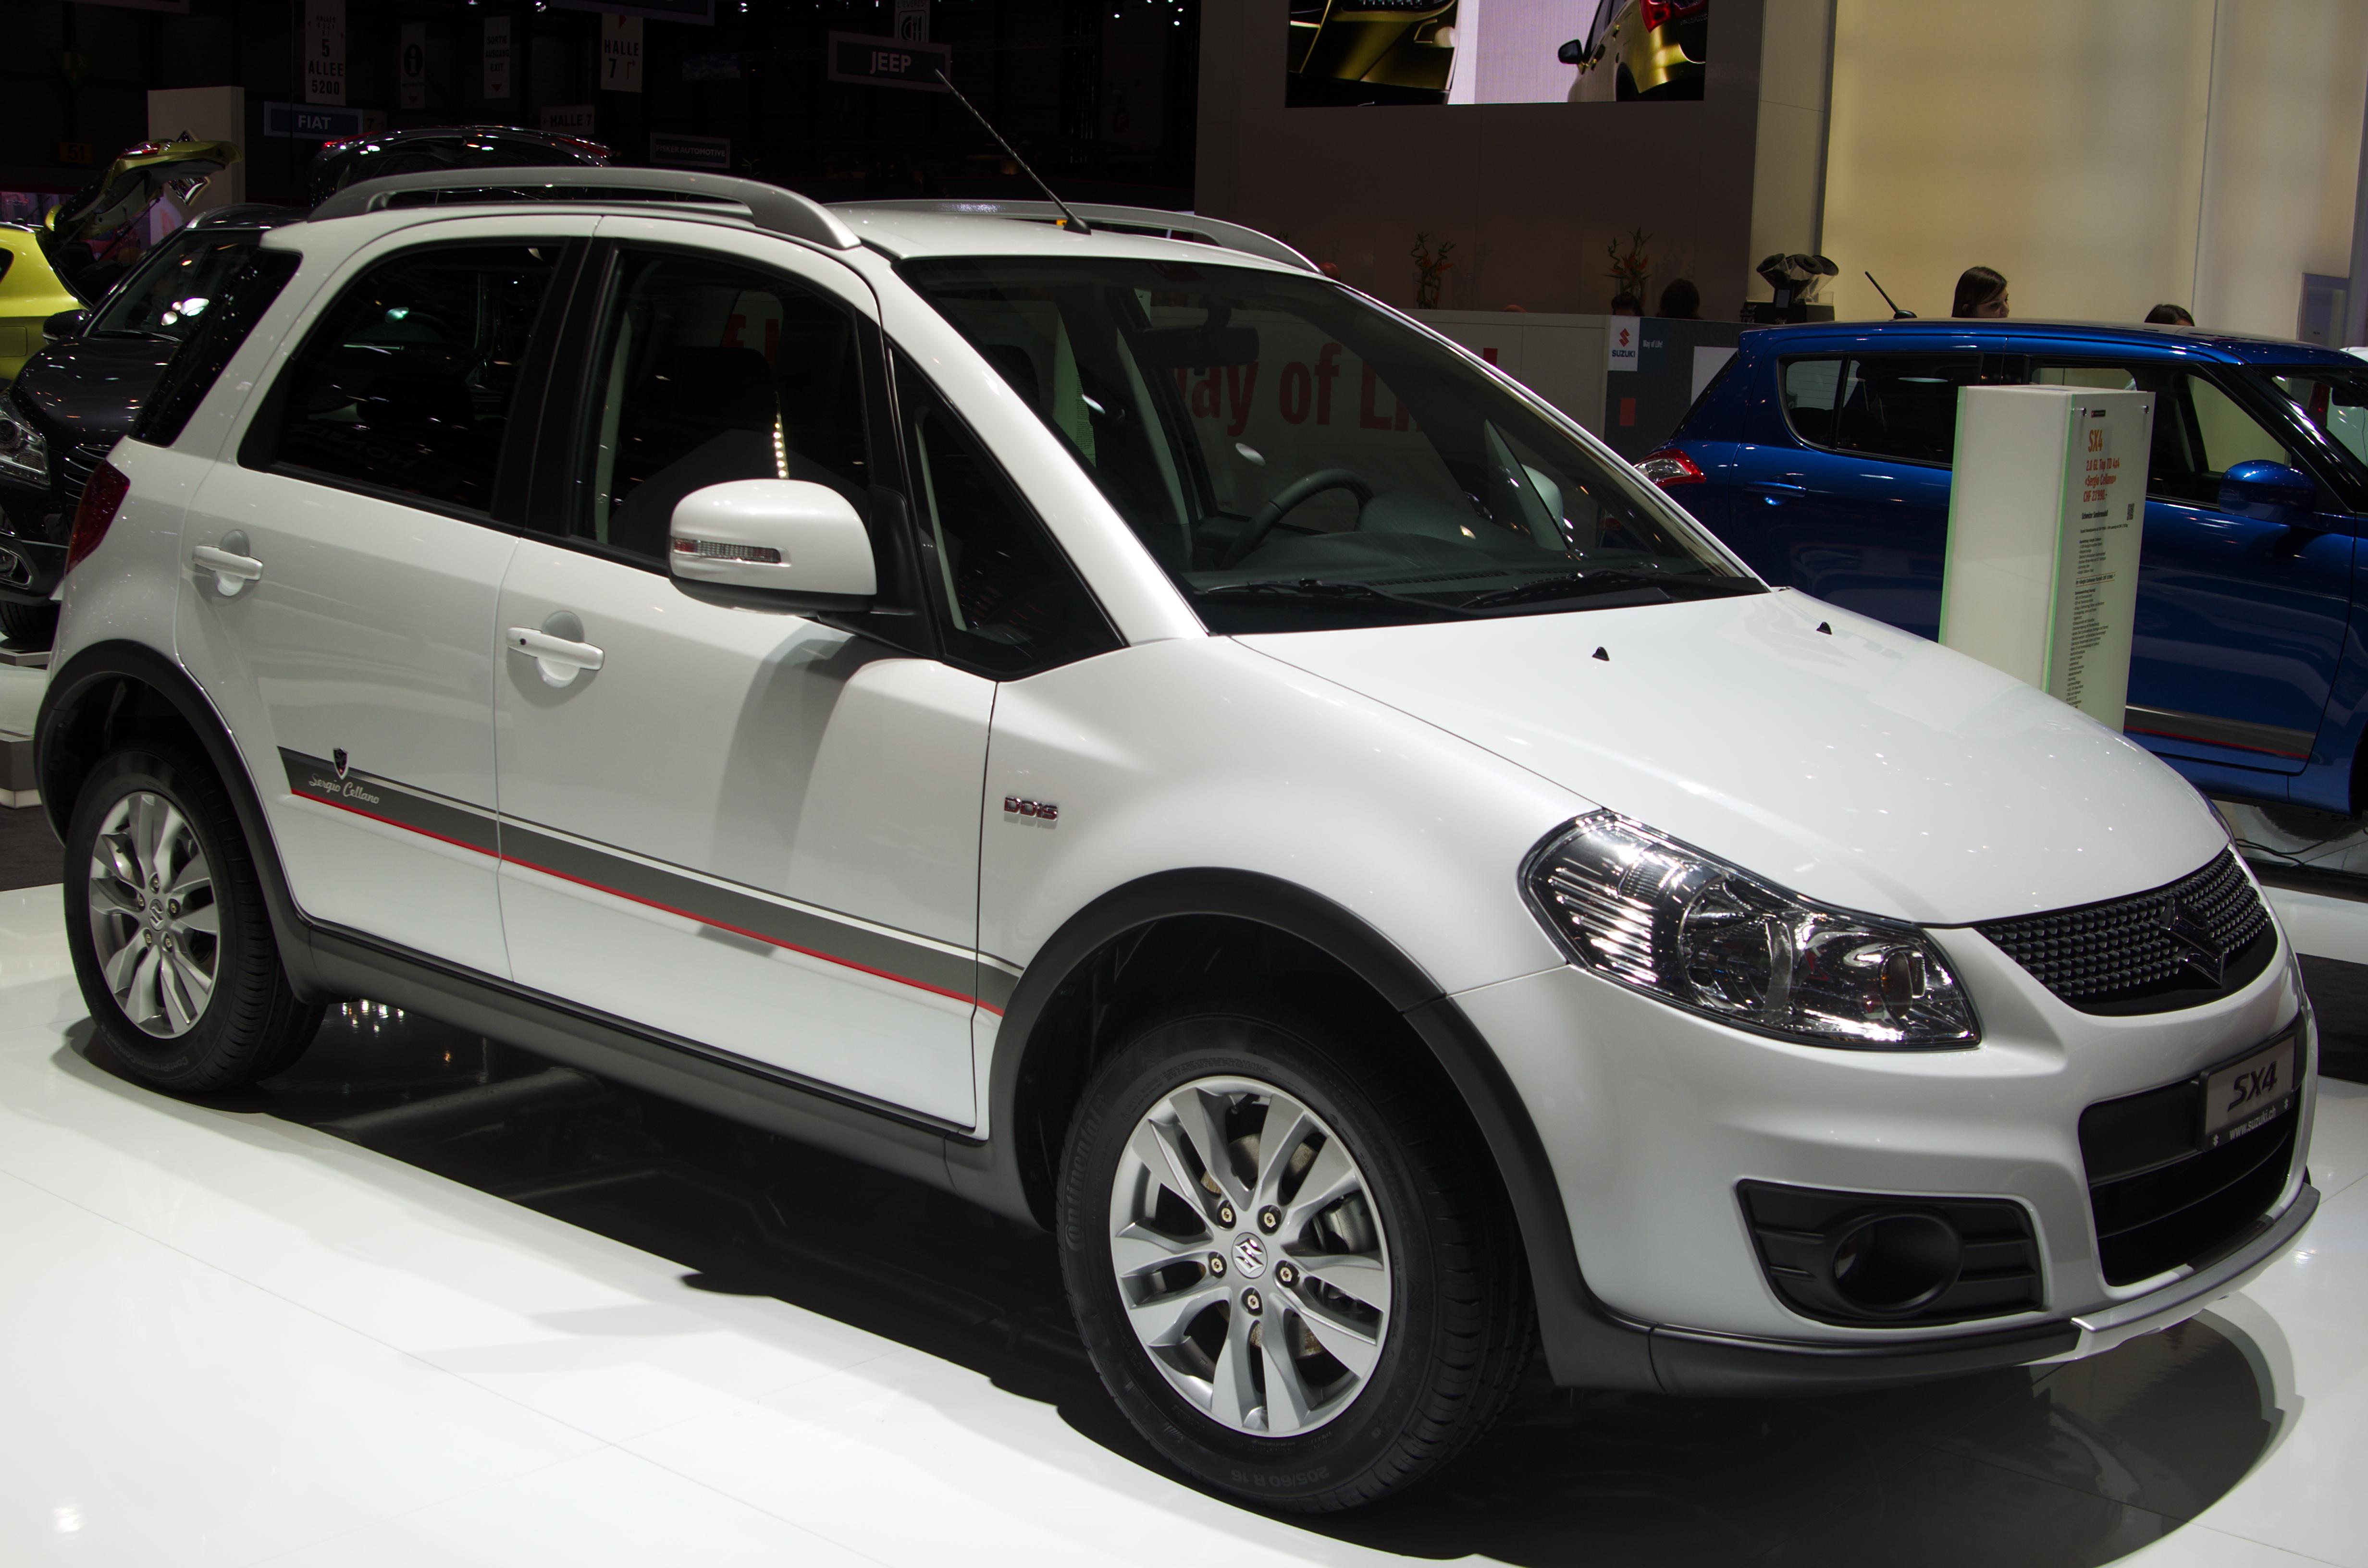 2013 Suzuki SX4 - Information and photos - Zomb Drive